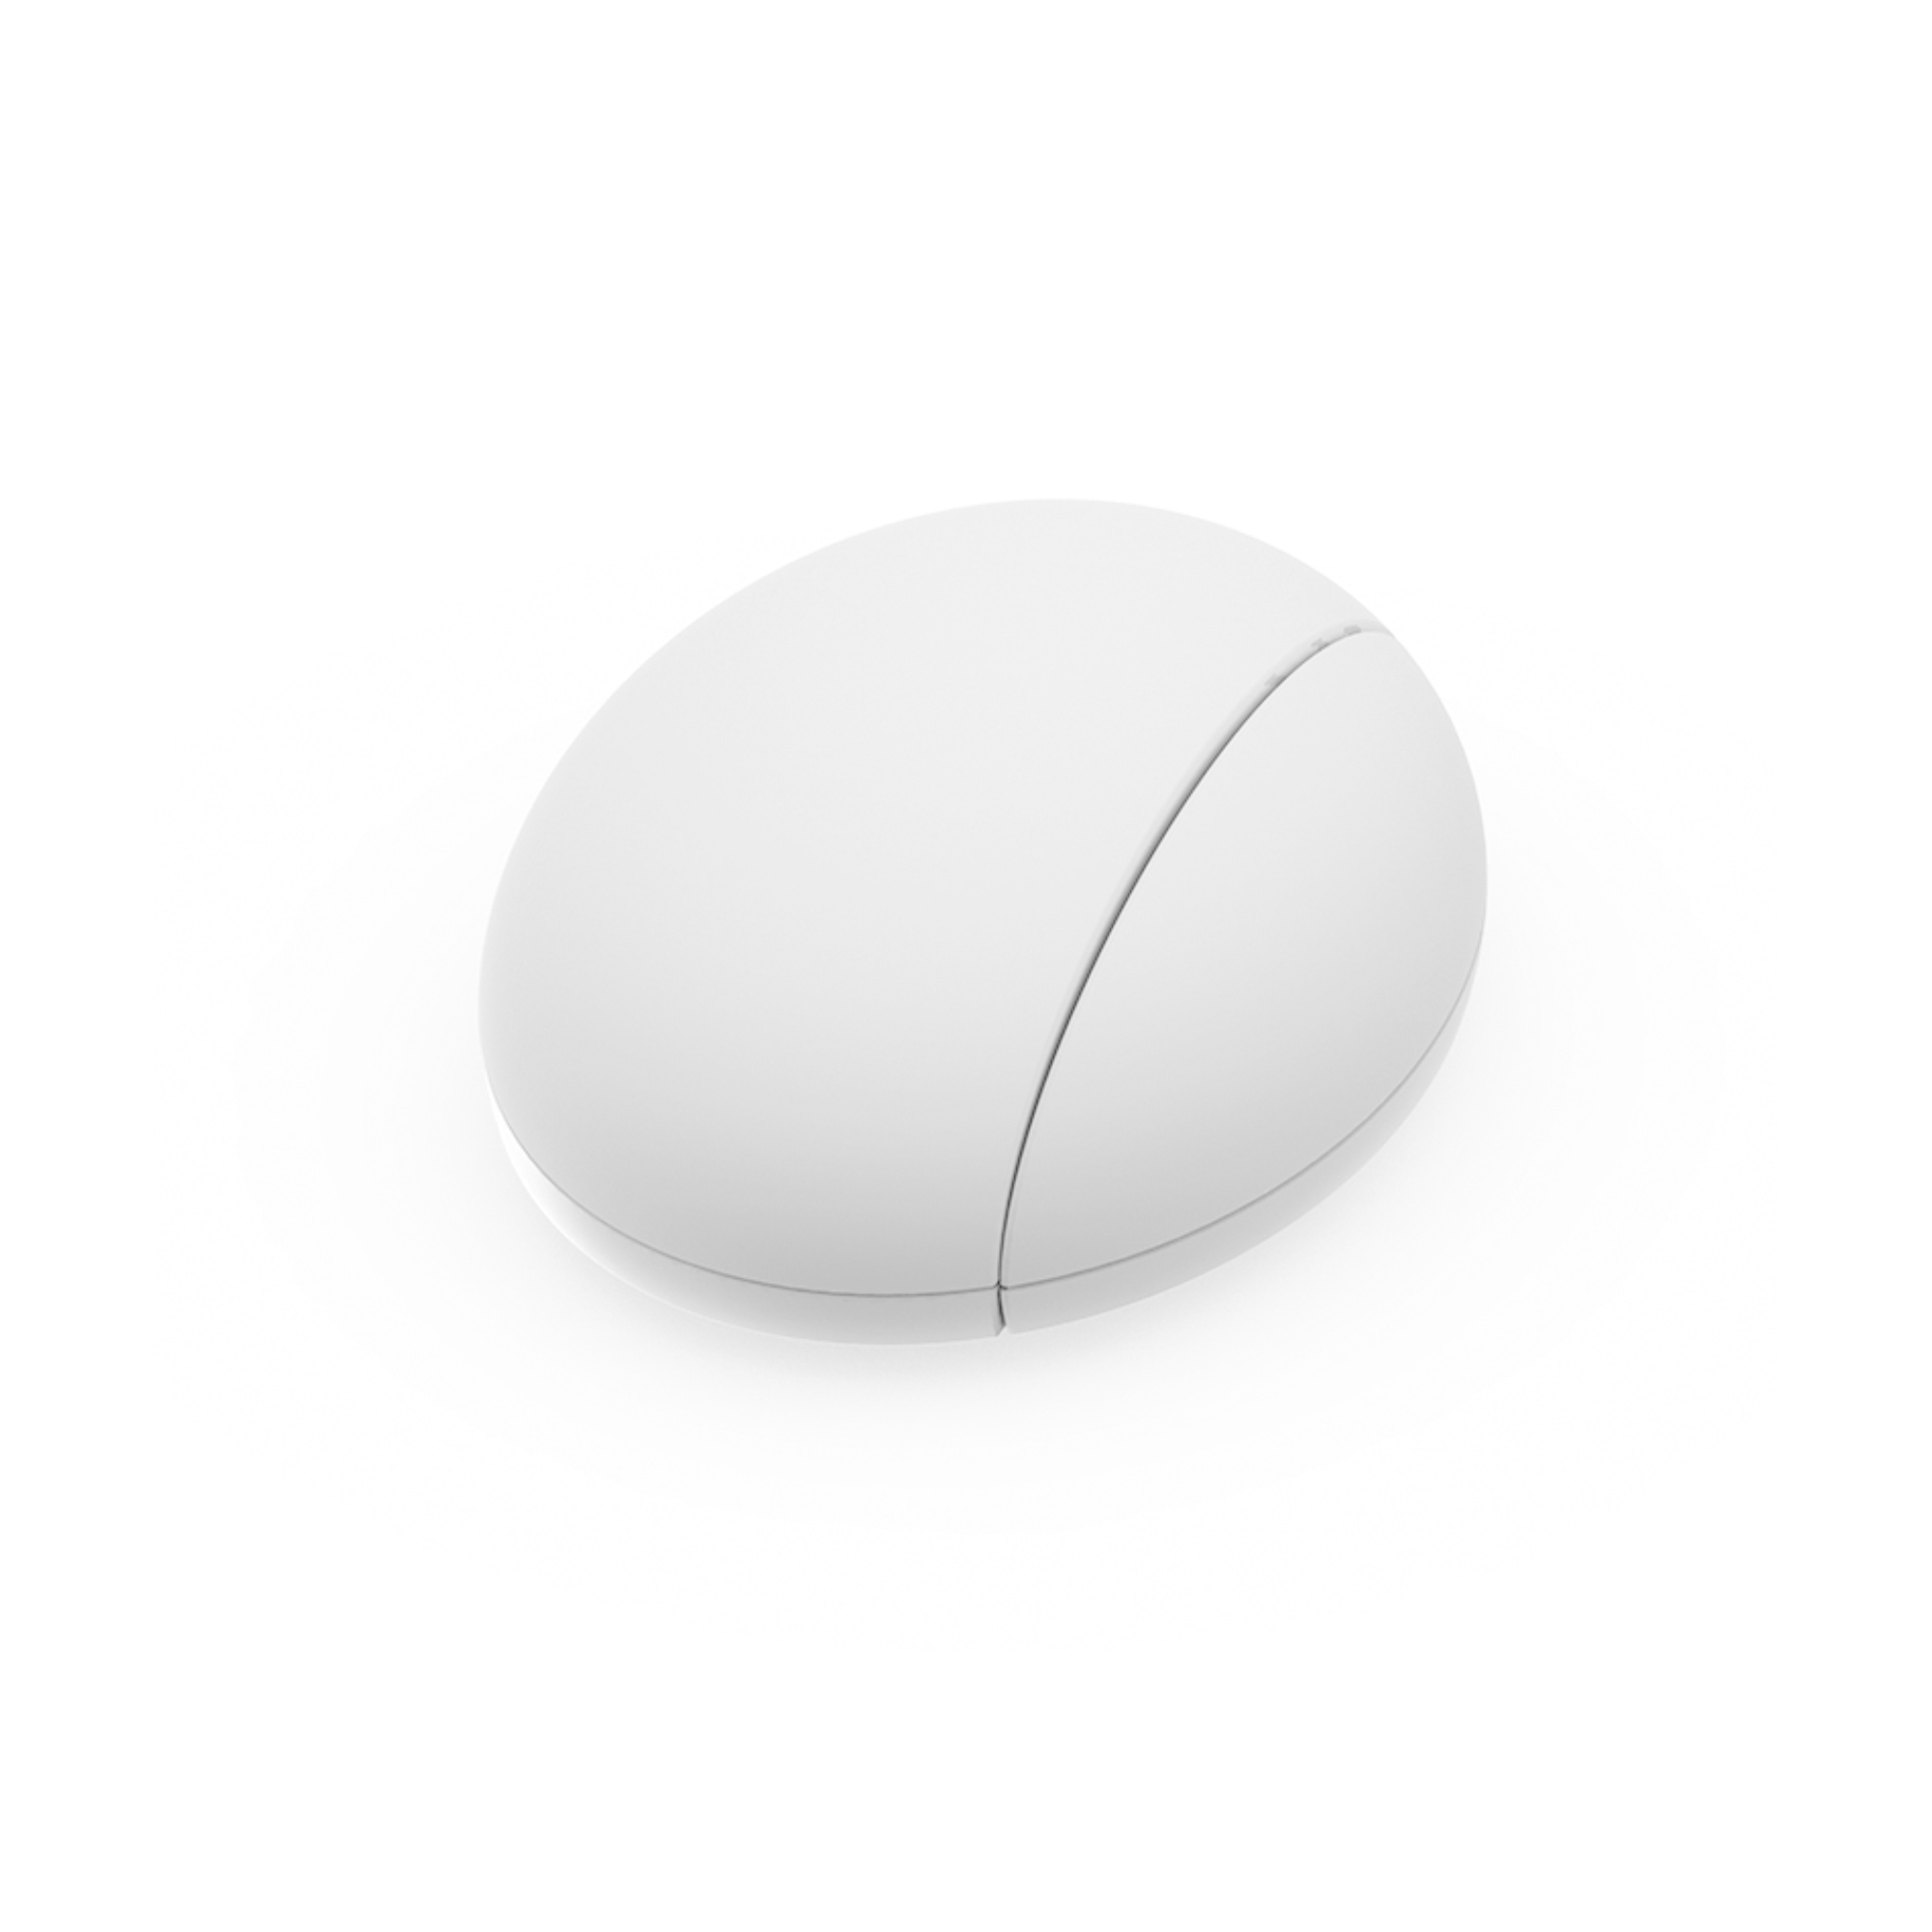 Sensref Bluetooth Based Round Magnetic Door Sensor